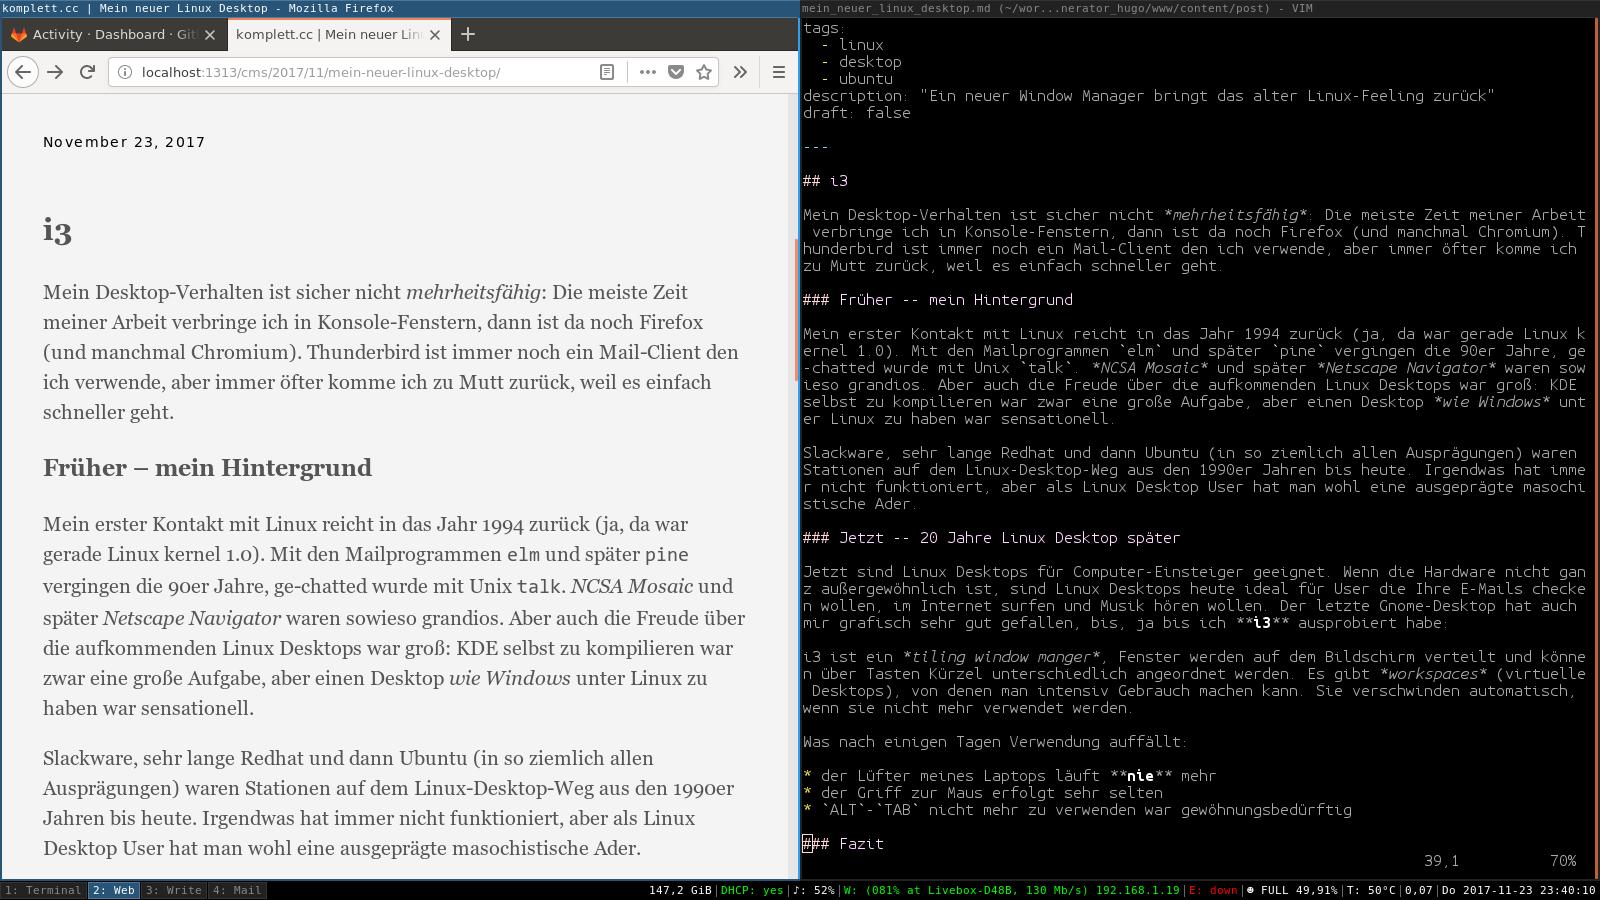 image from i3 - Mein neuer Linux Desktop